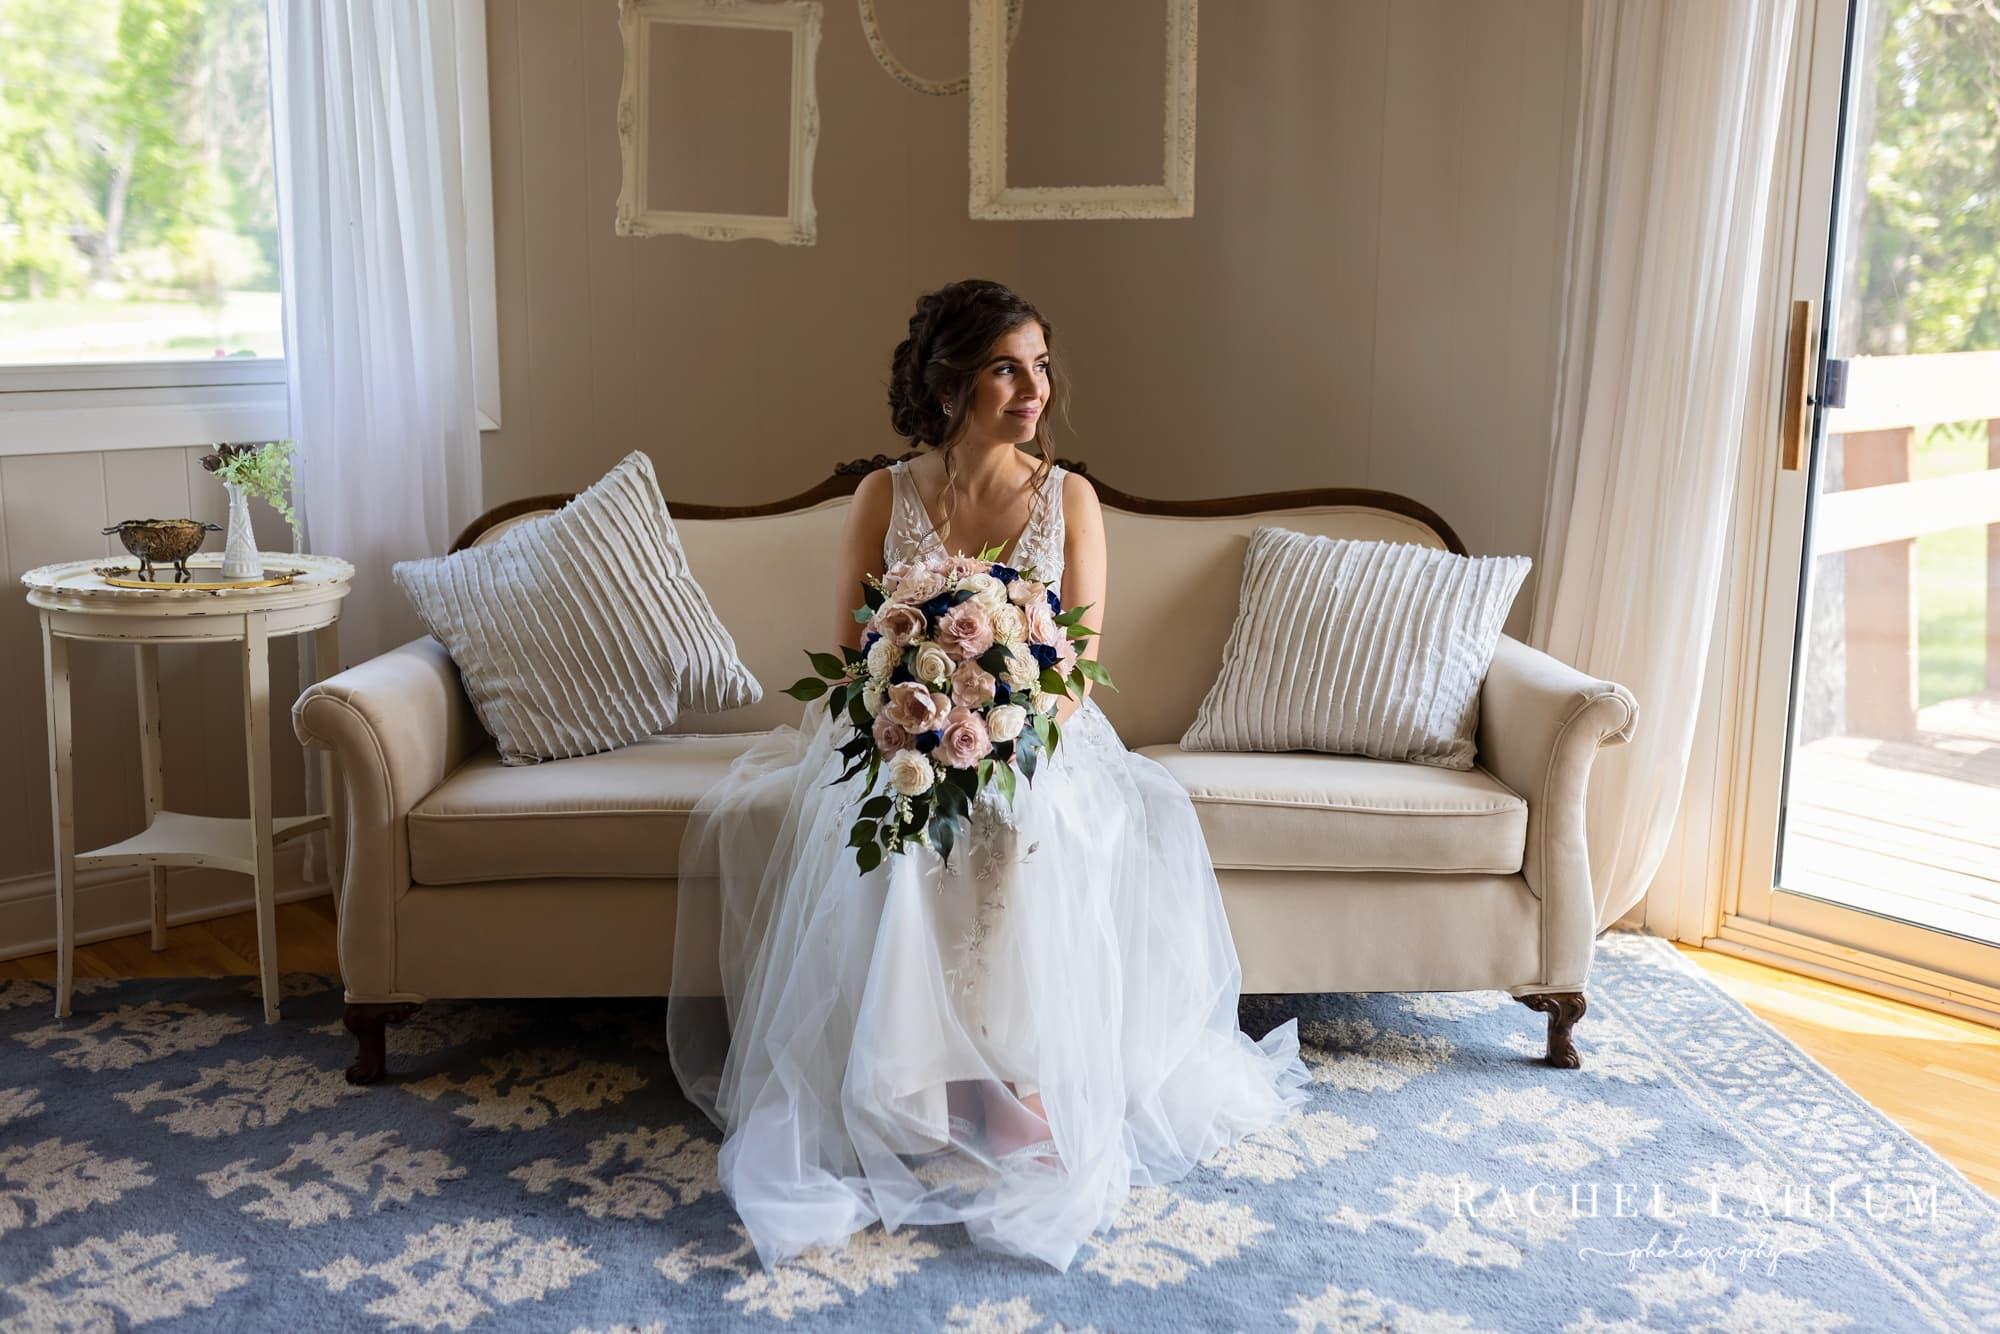 Portrait of bride in bridal suite at The Cottage Farmhouse.